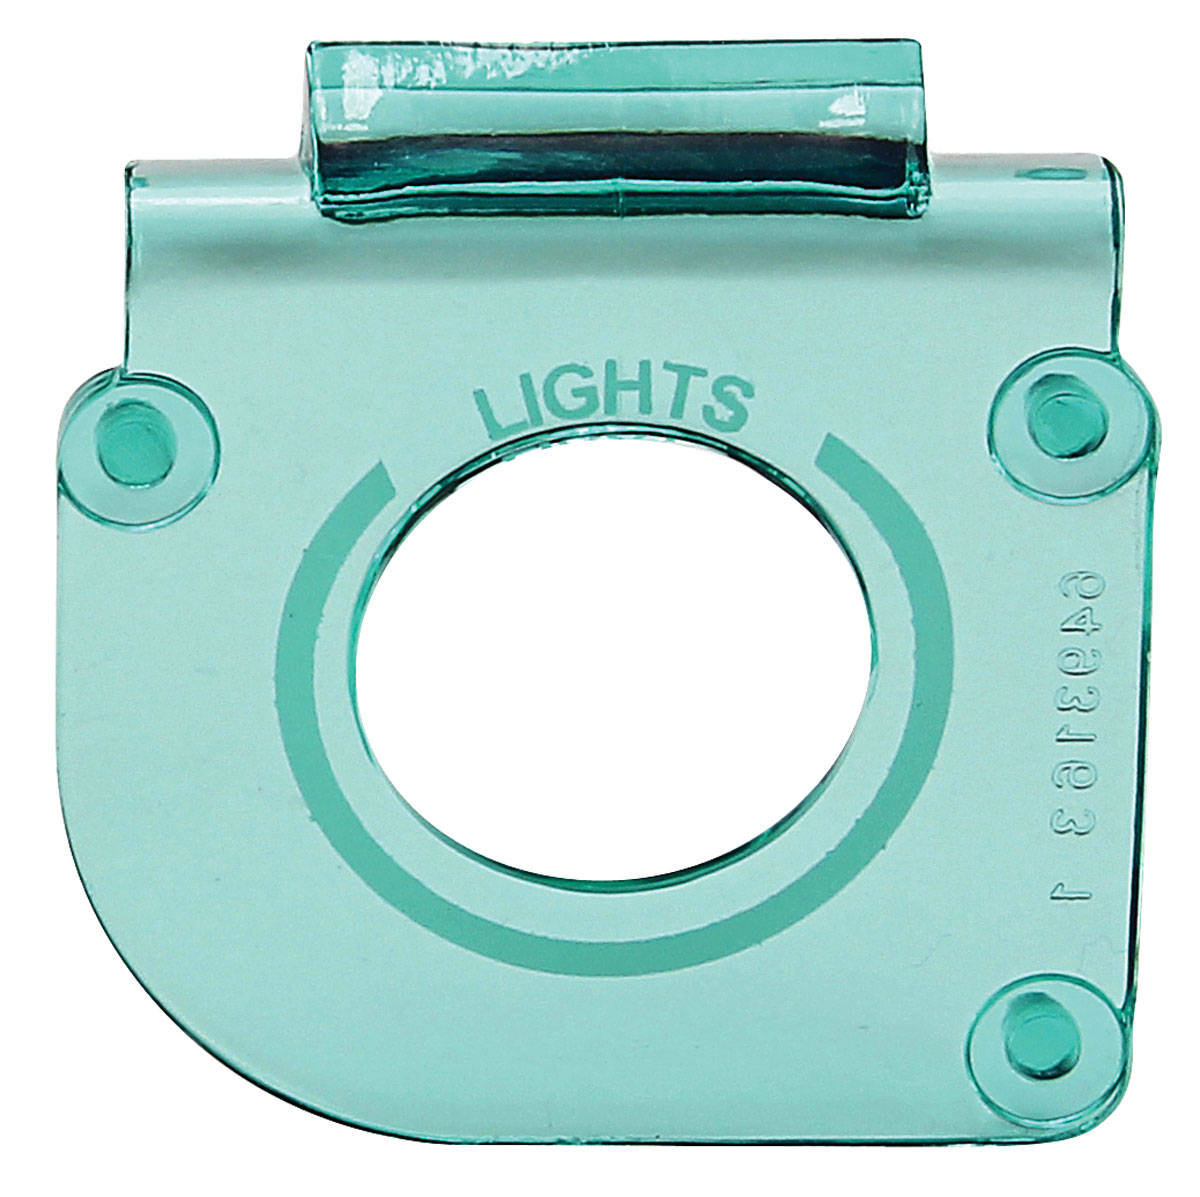 Photo of Lens, Headlight Switch green